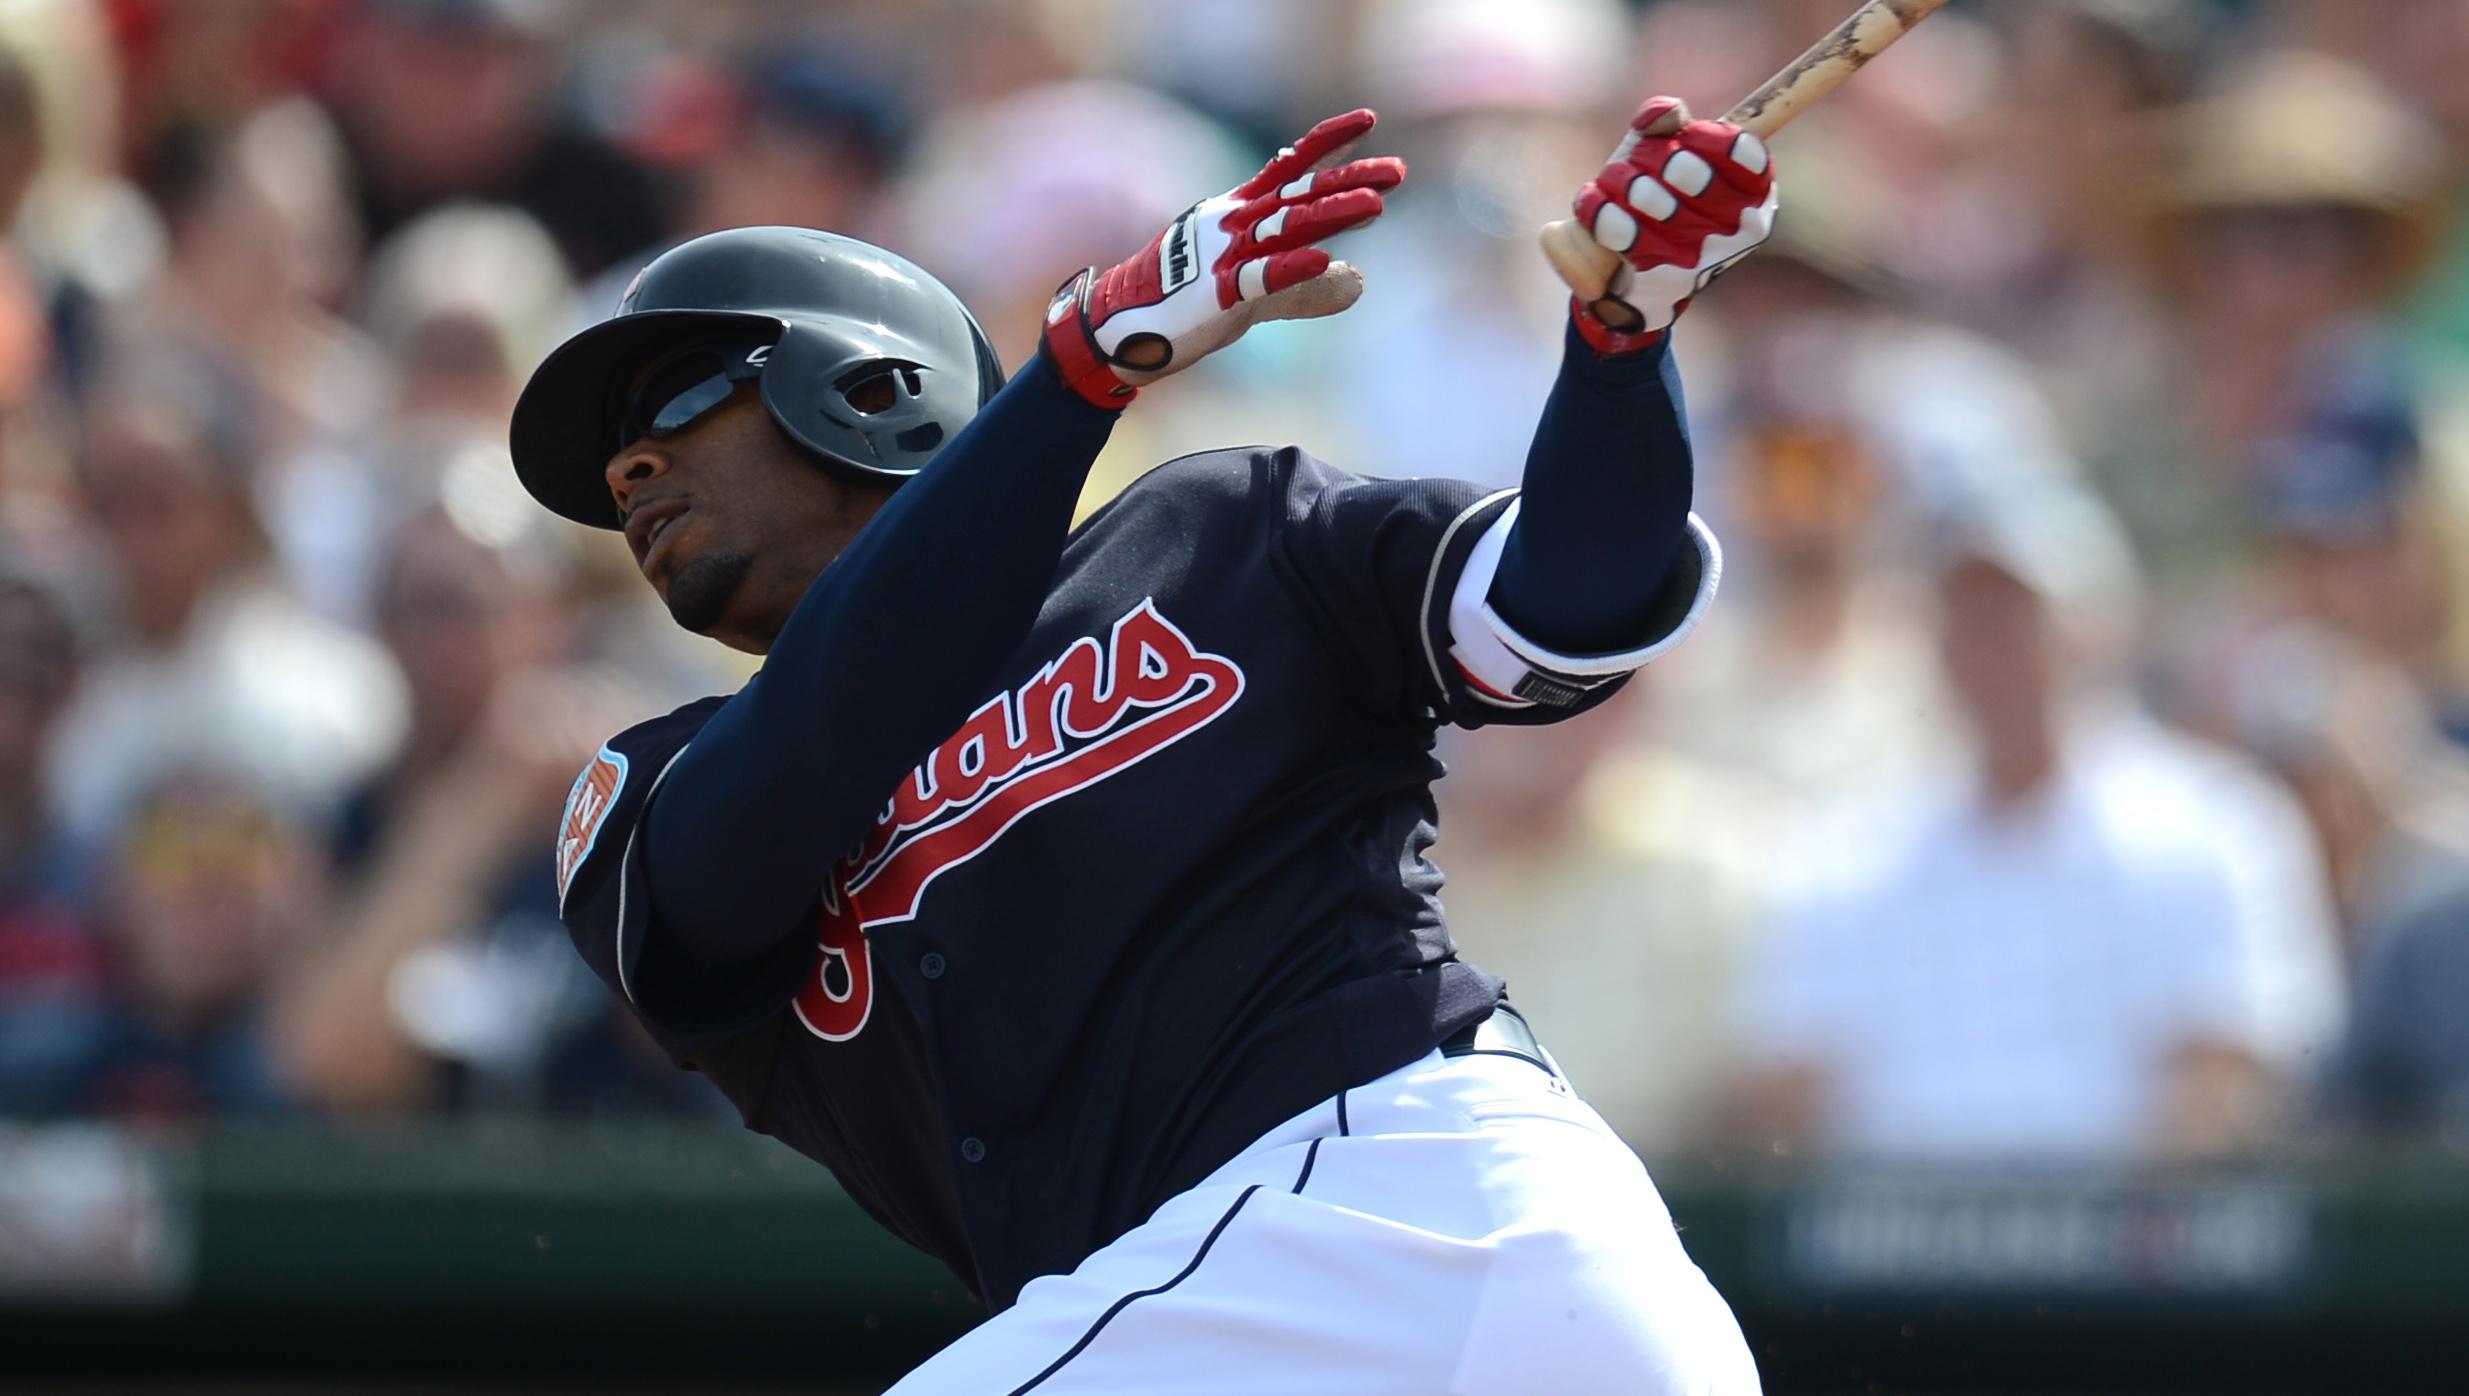 Will Rajai Davis be the Tribe center fielder in 2016?